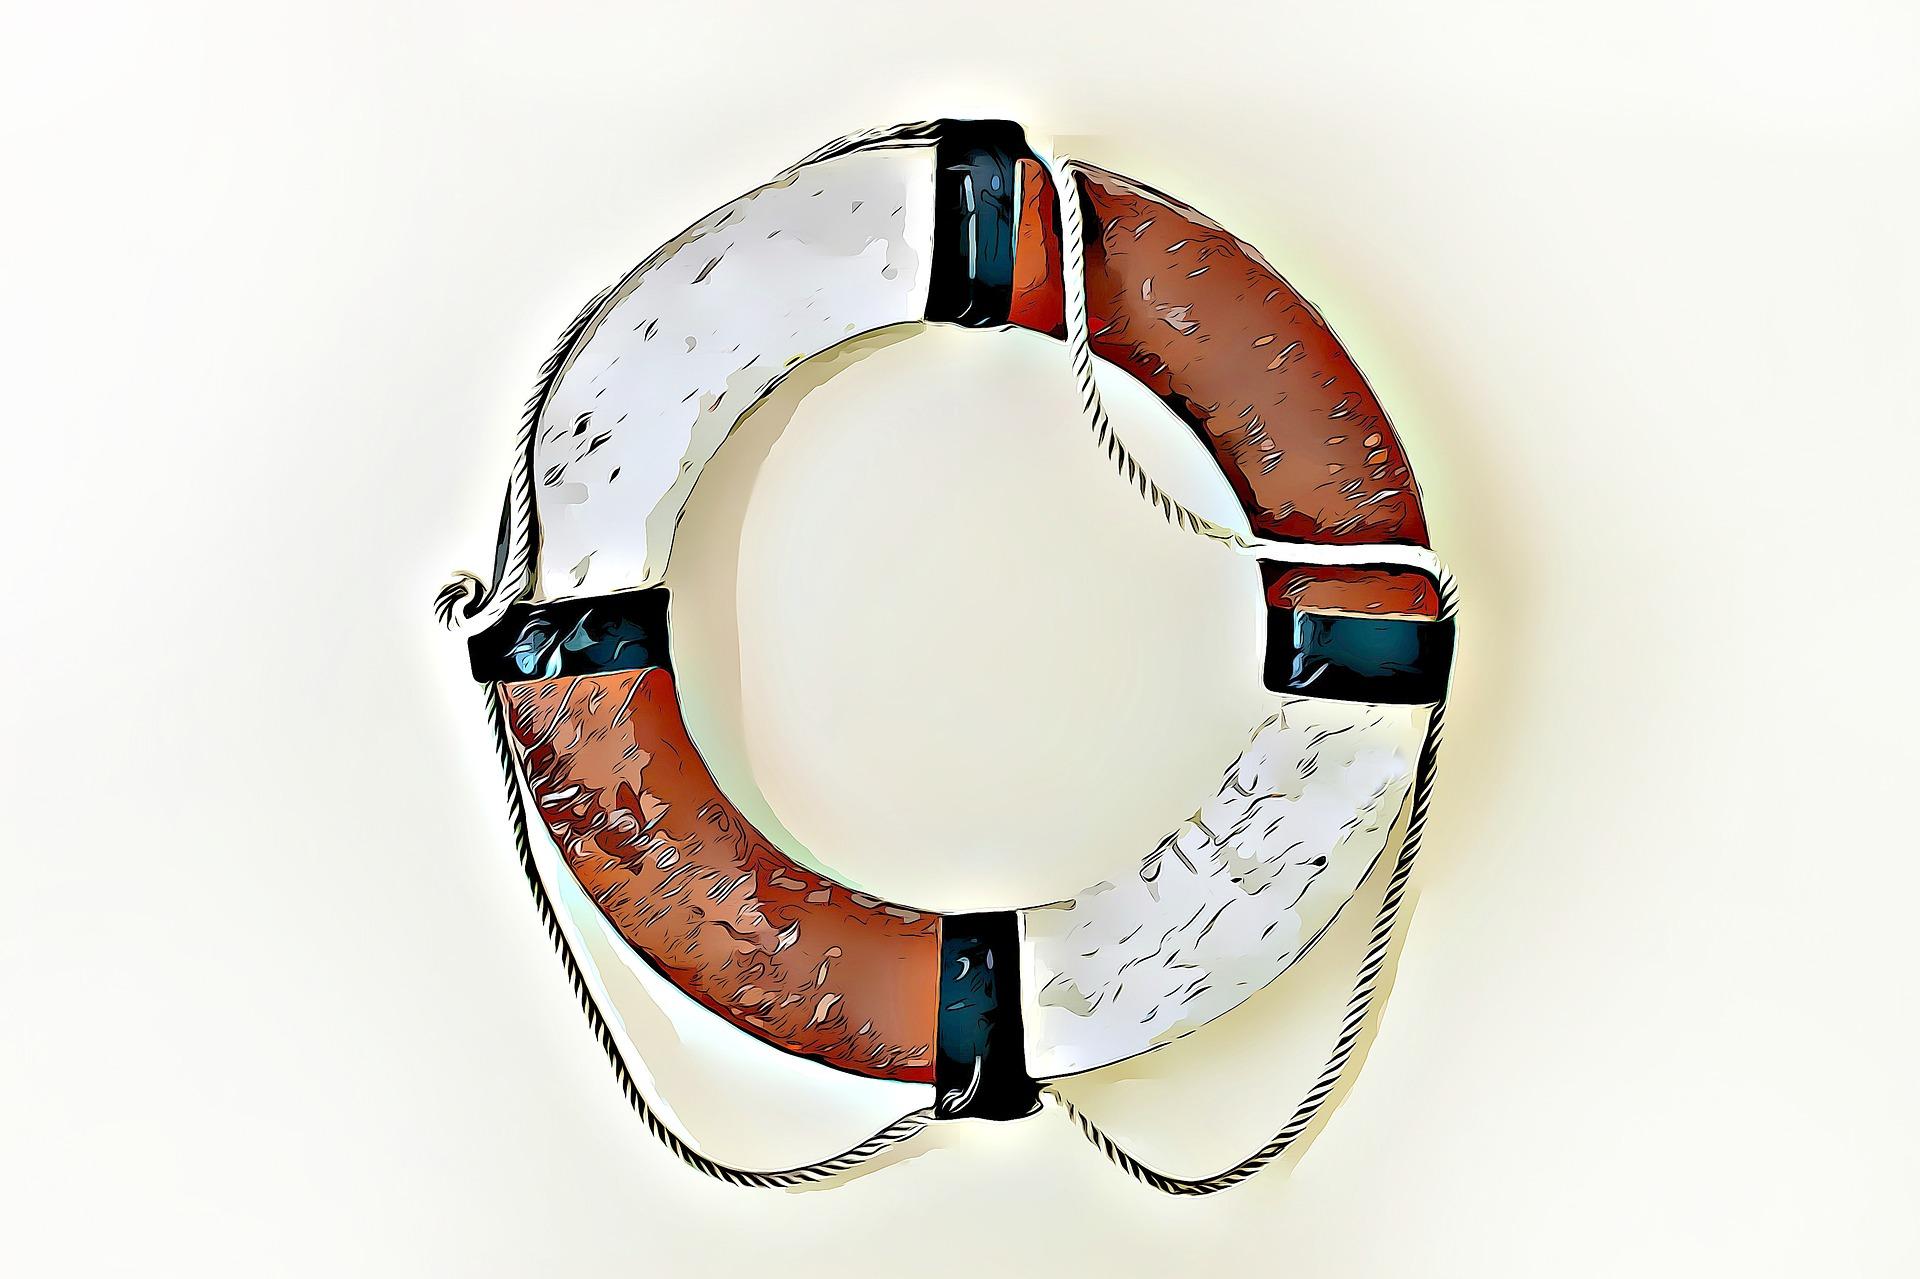 life-buoy-2143181_1920.jpg